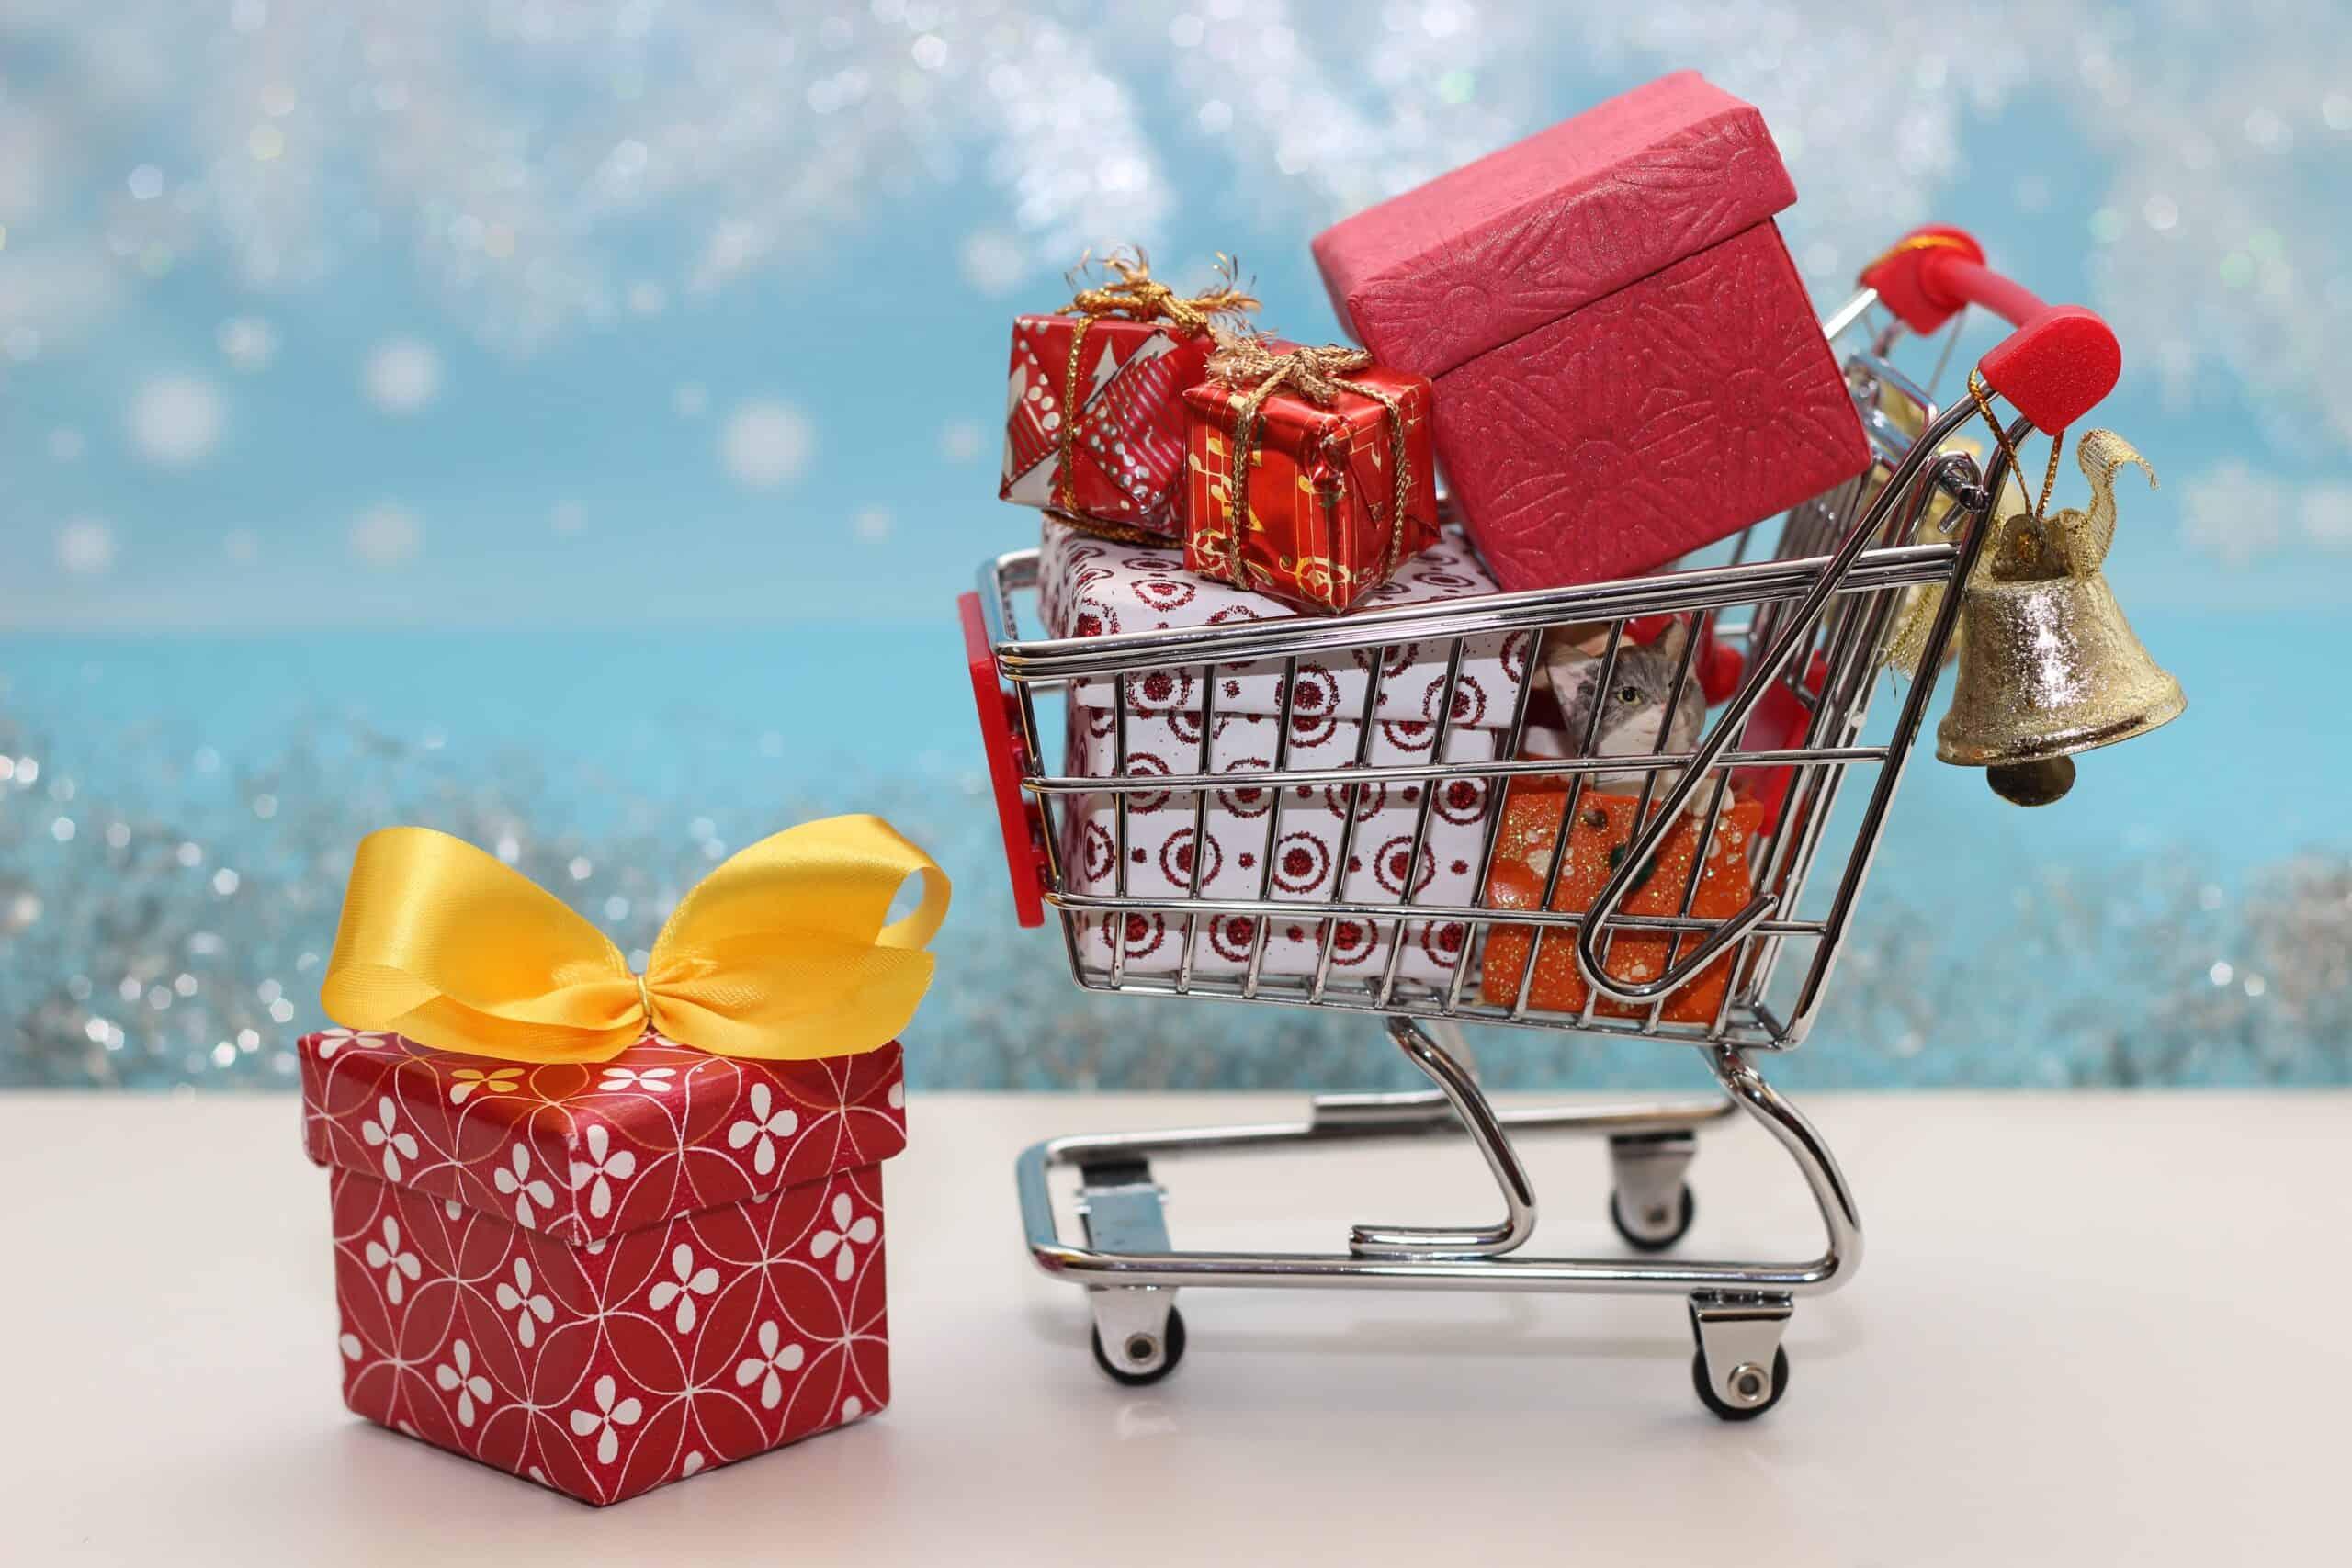 How do you get those Christmas sales bargains?